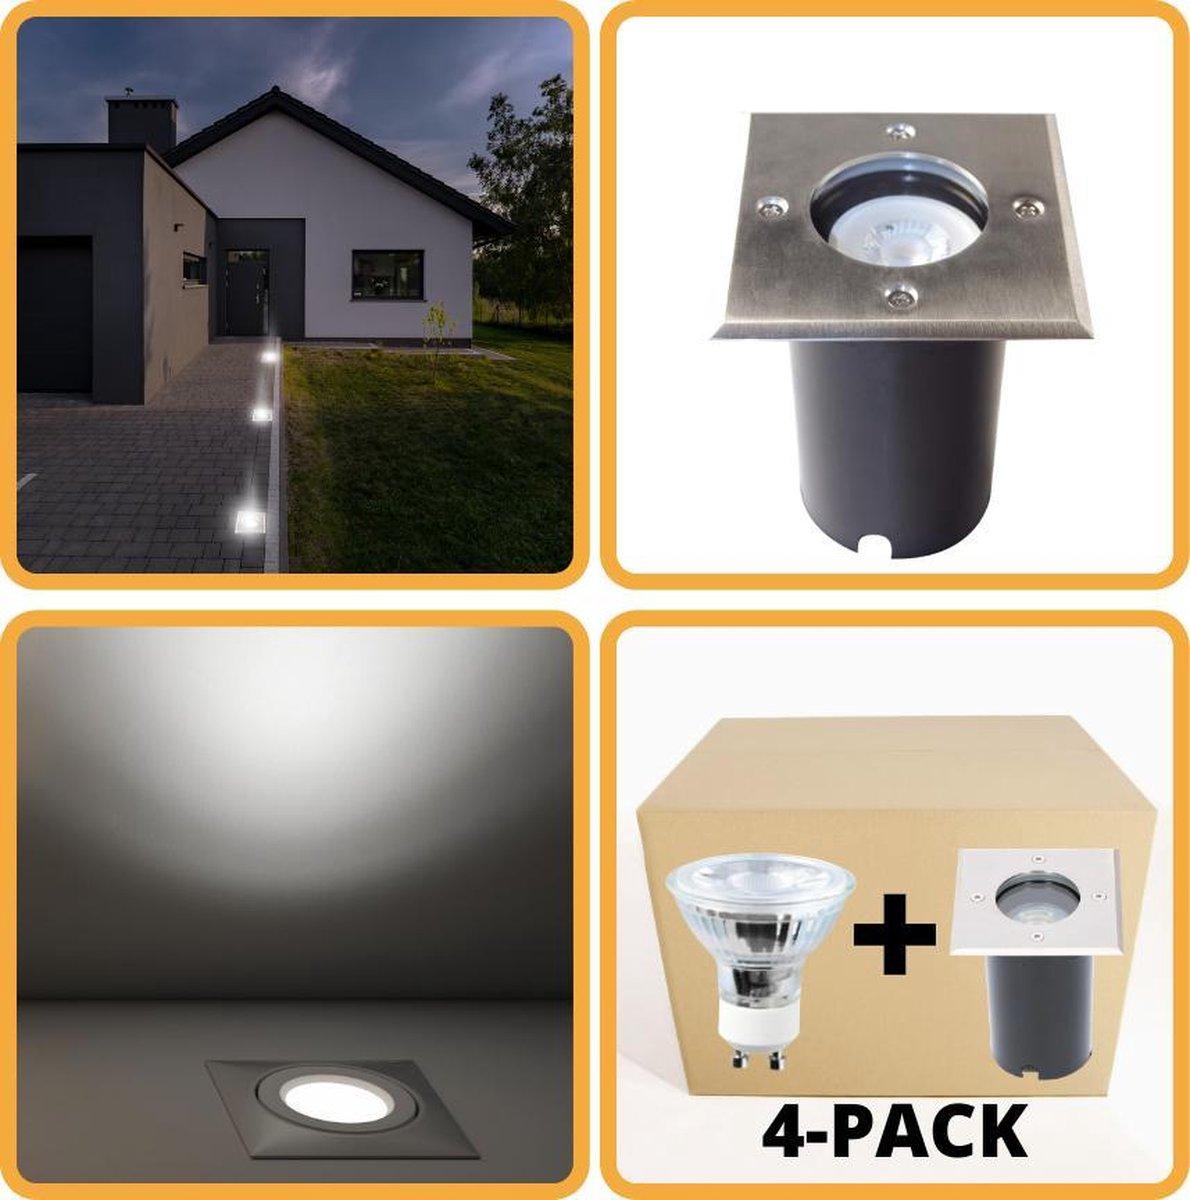 Proventa HeavyDuty LED Grondspots IP67 - Vierkant - 4 x inbouw tuinspots buiten - koud wit